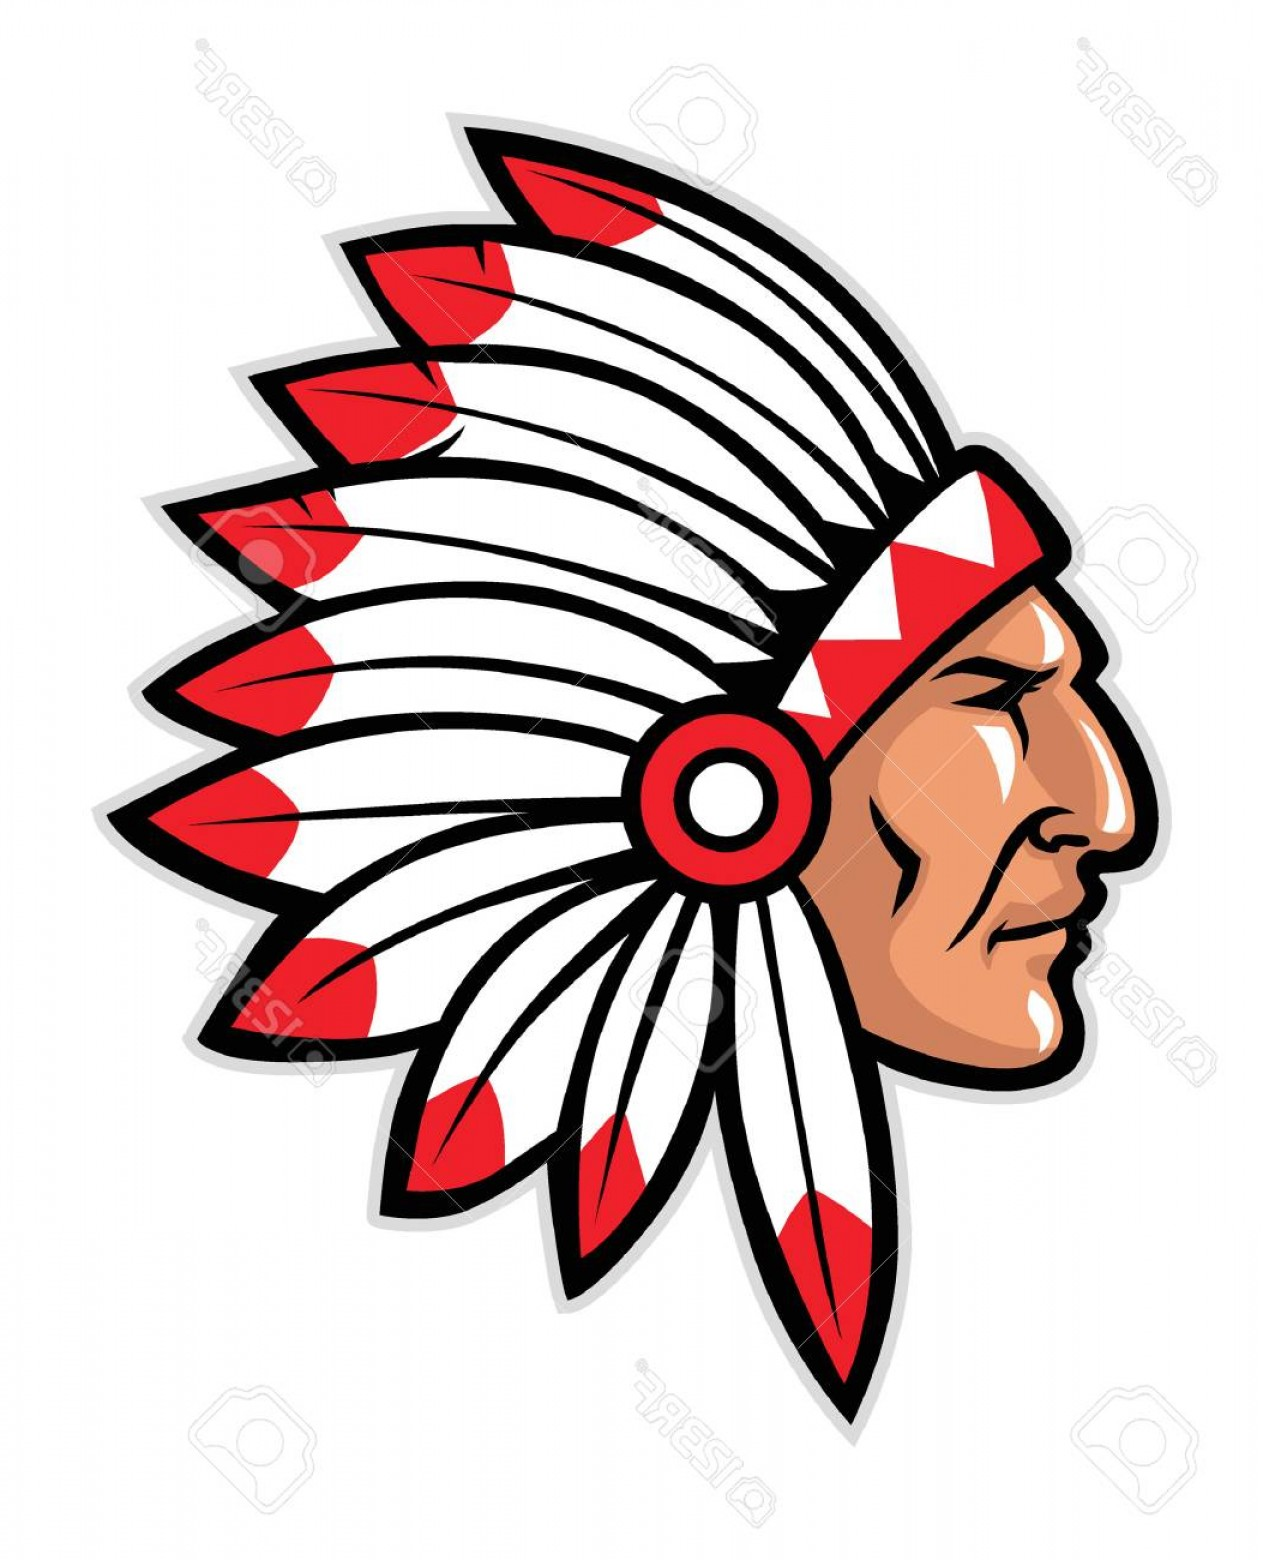 Photostock Vector Head Mascot Of Native American Warrior.